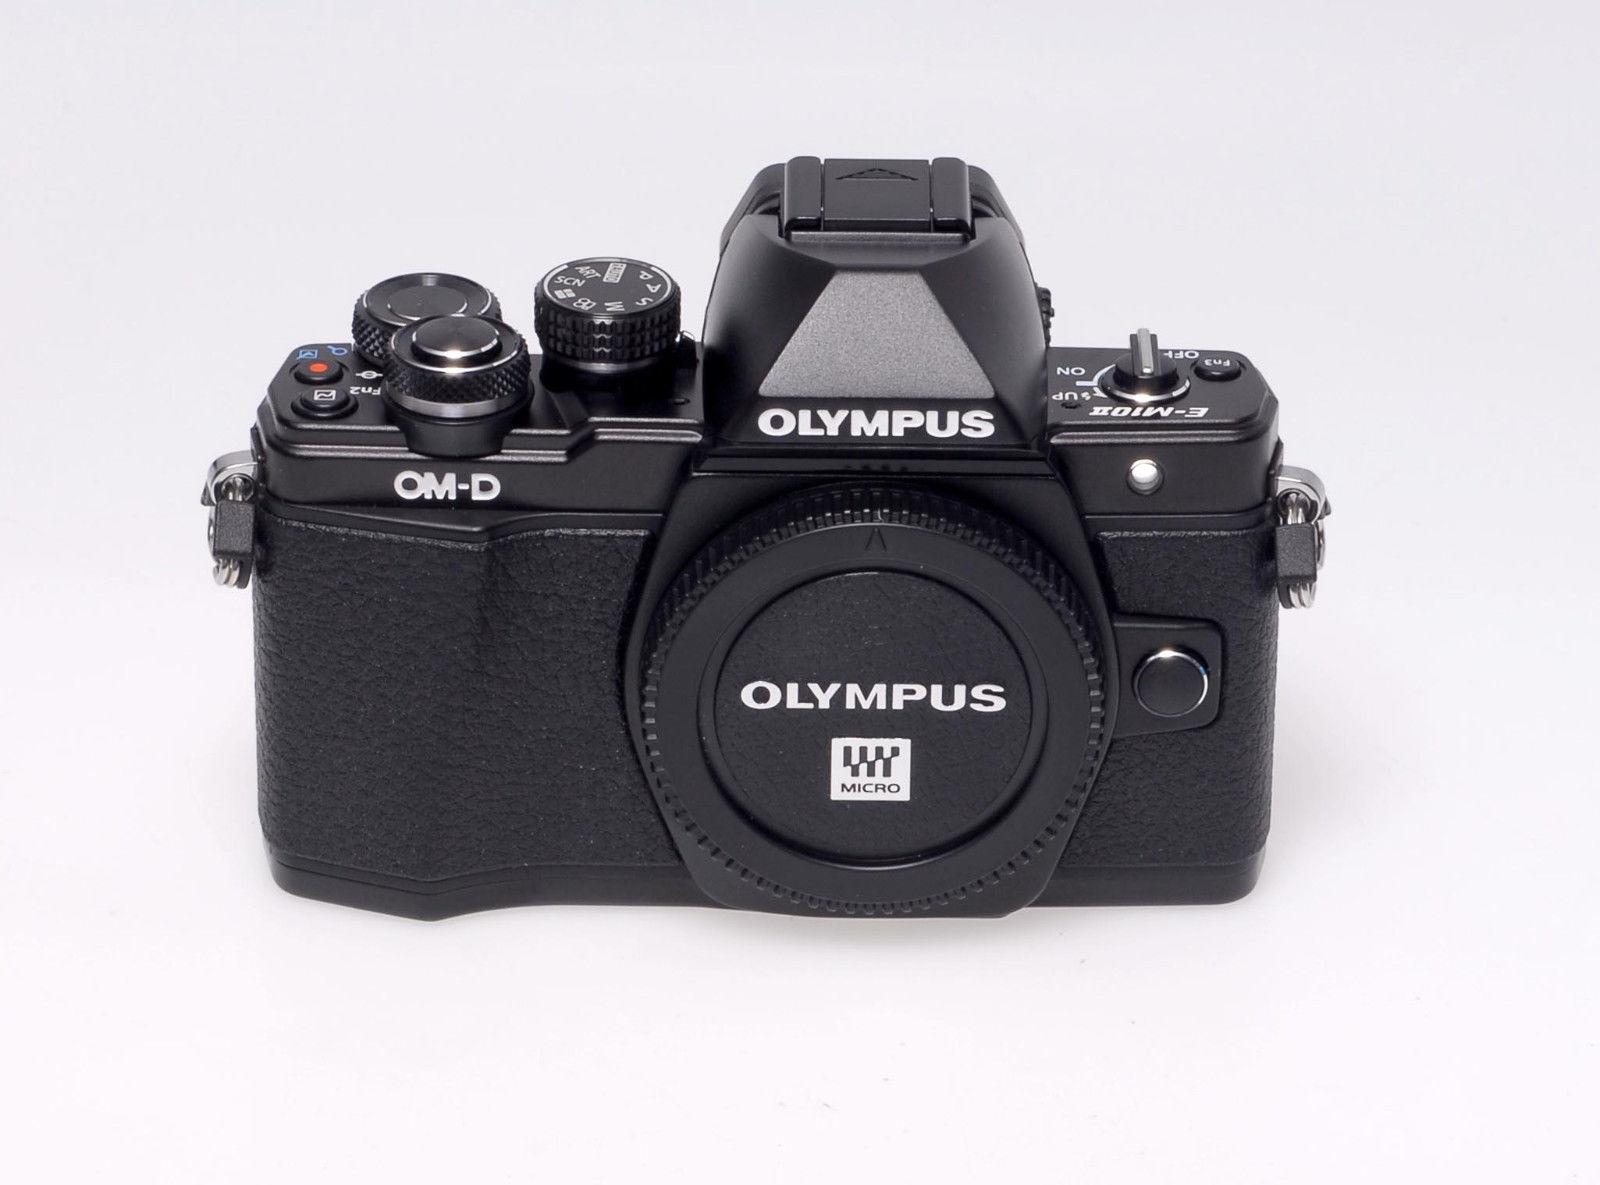 Olympus OM-D E-M10 Mark II Digitalkamera - schwarz - gebraucht